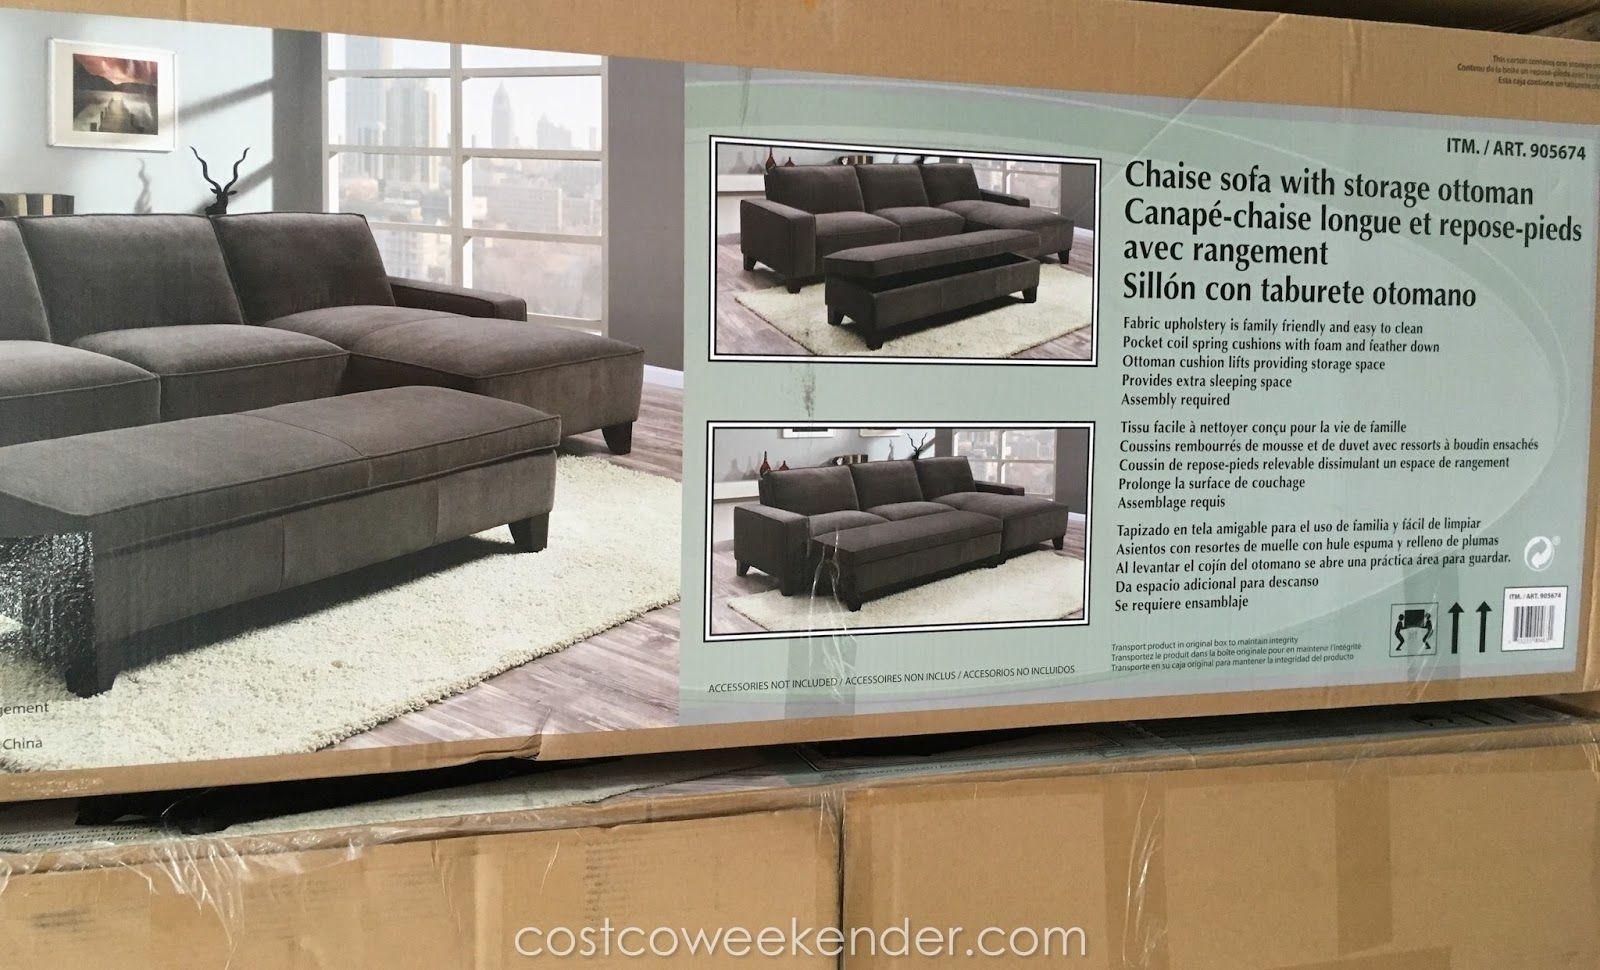 Costco Sectional Sofa With Storage Ottoman #homedecor